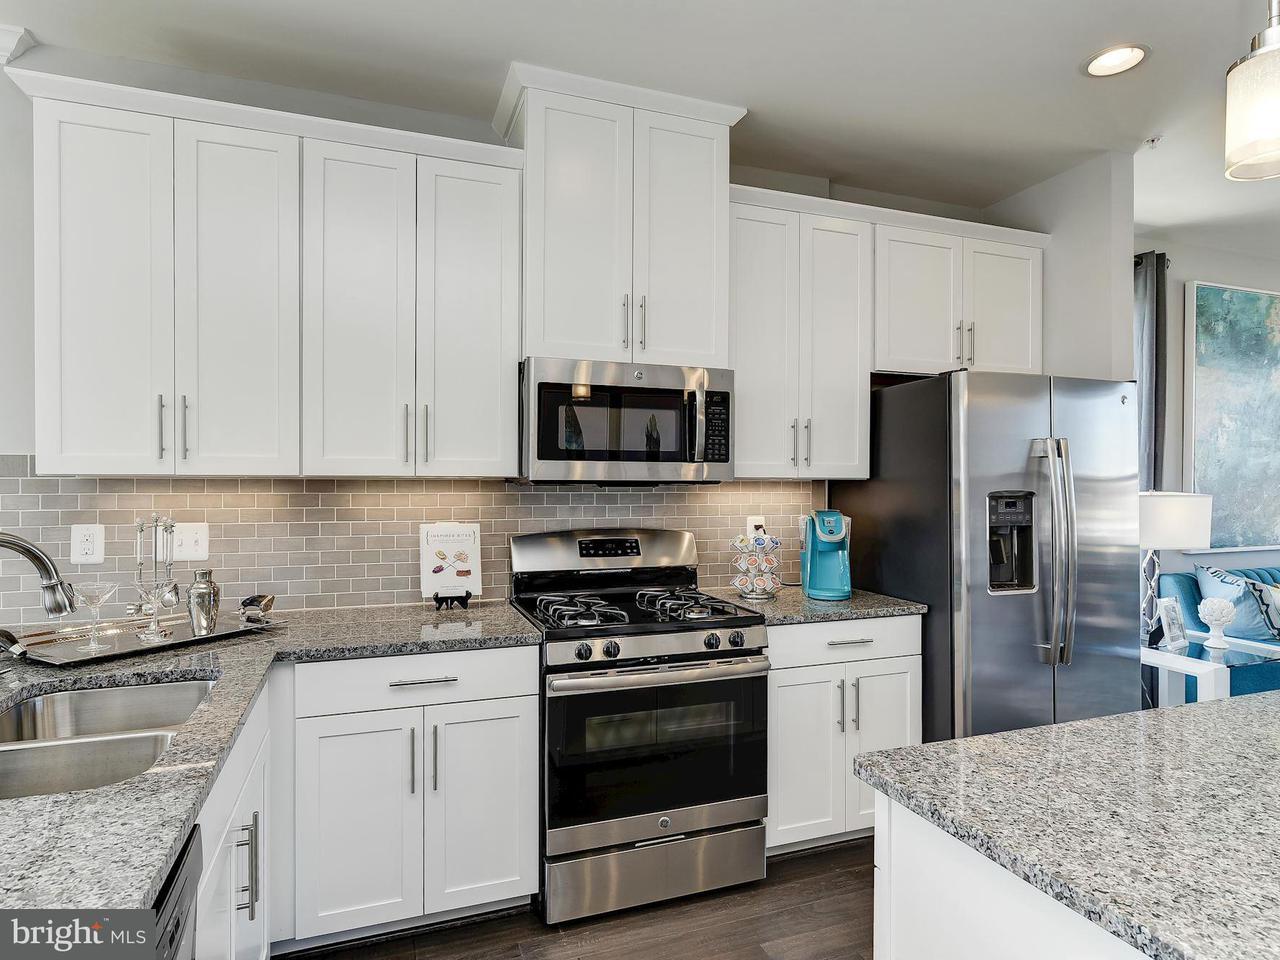 Additional photo for property listing at 3635 JAMISON ST NE 3635 JAMISON ST NE 华盛顿市, 哥伦比亚特区 20018 美国